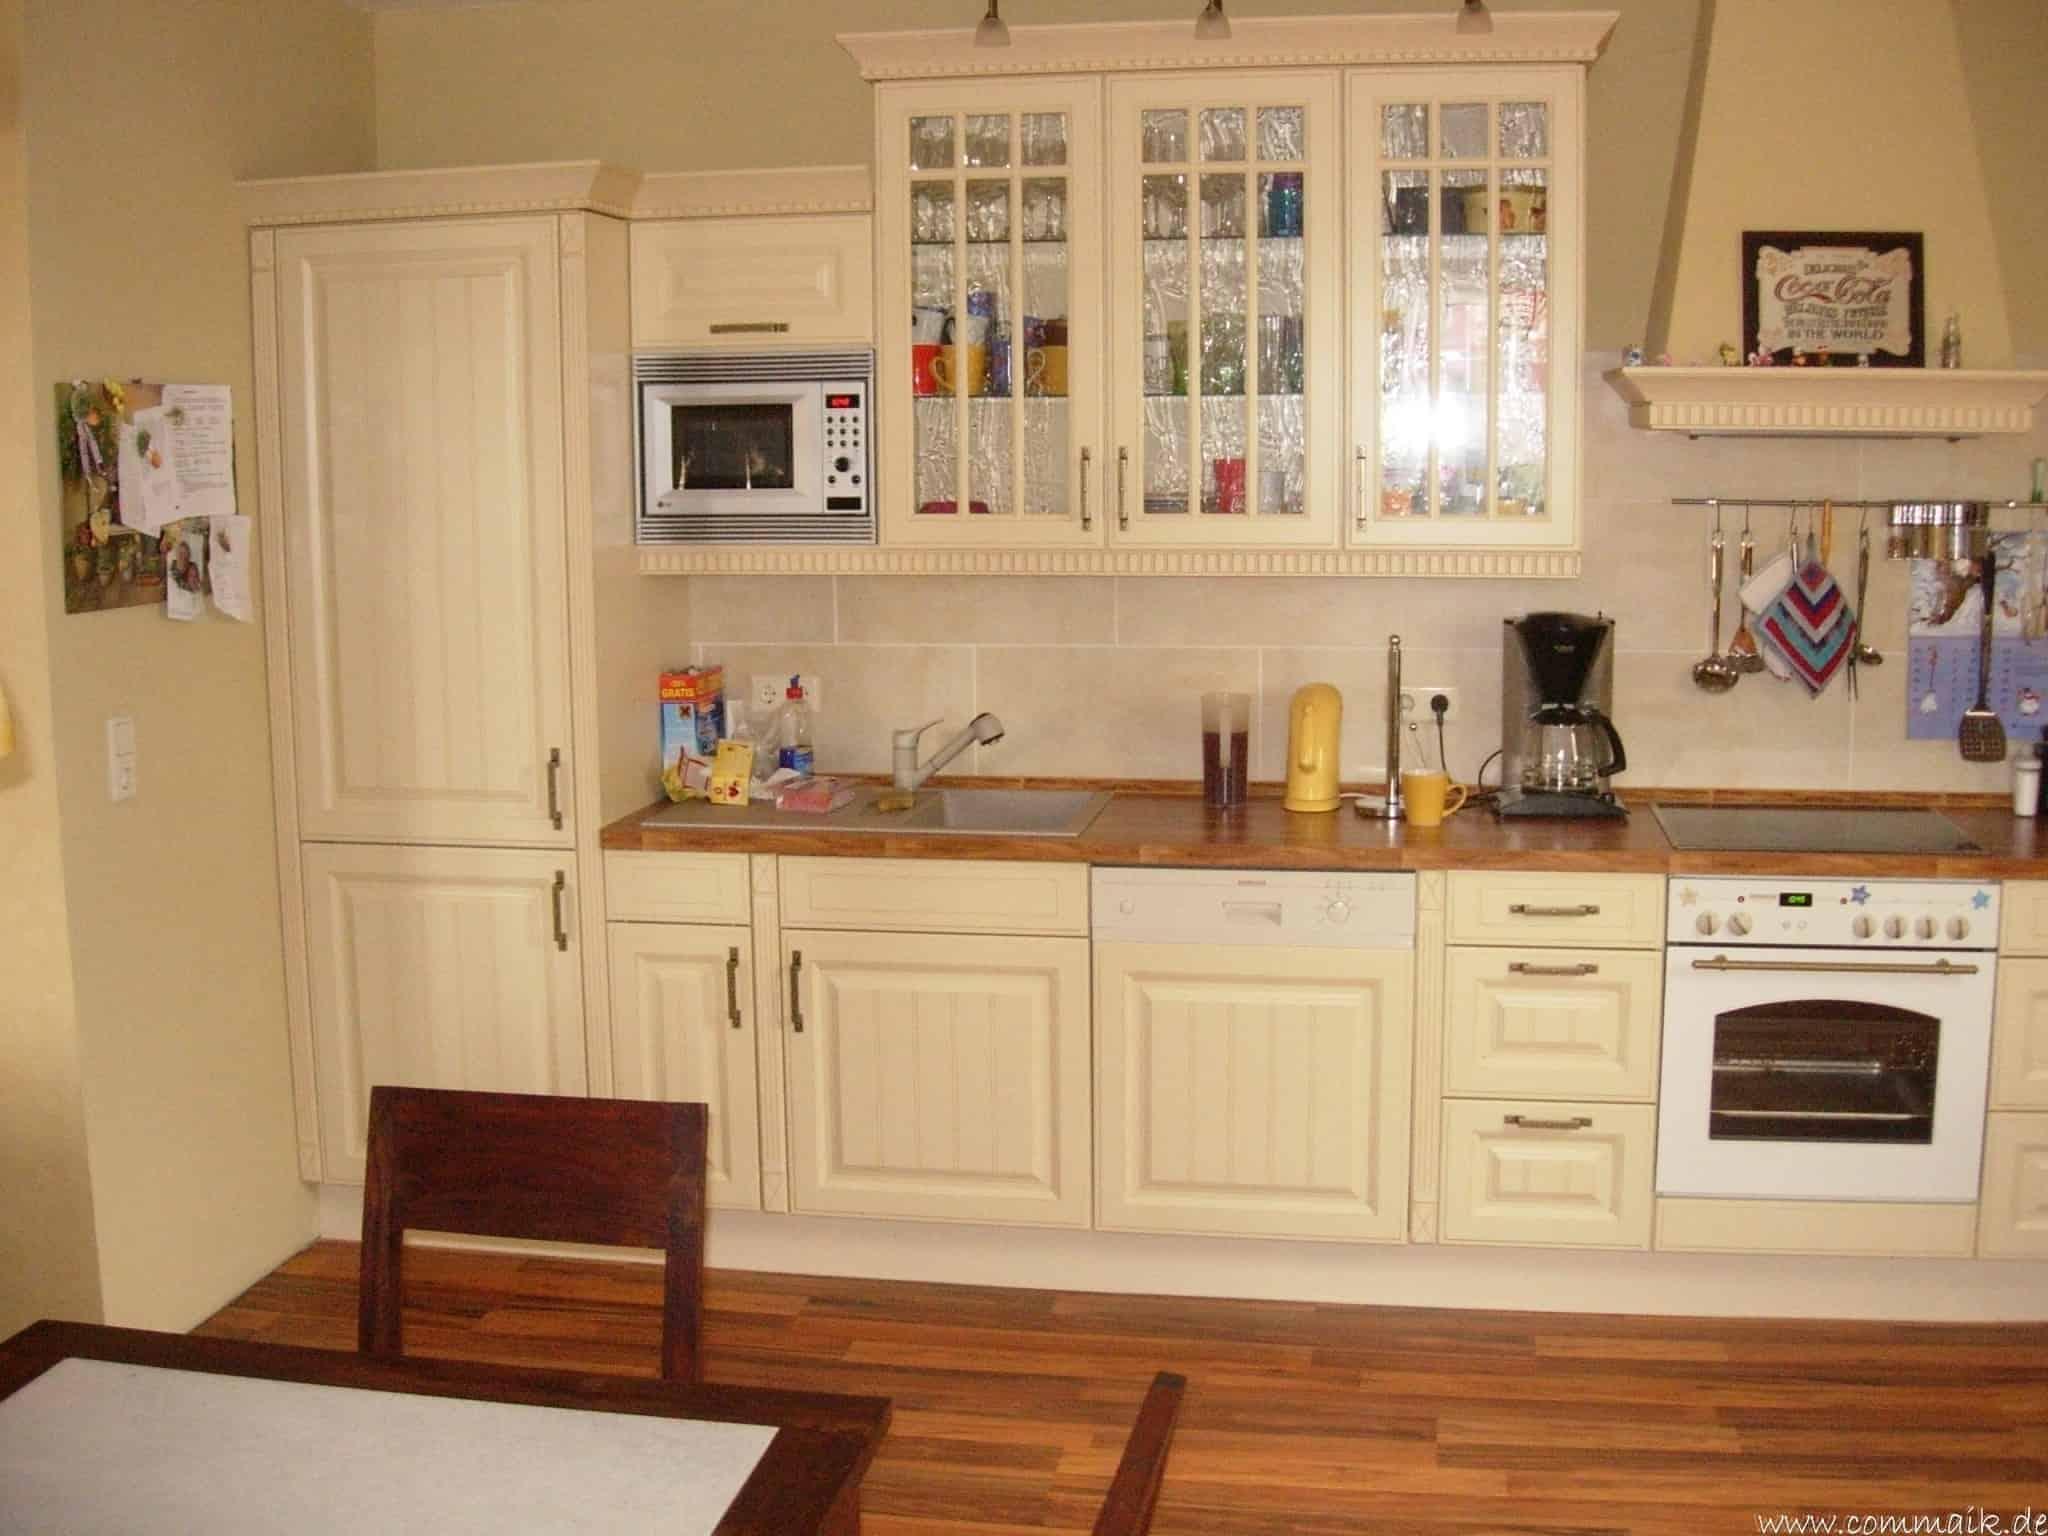 bildergalerie k che im obergeschoss. Black Bedroom Furniture Sets. Home Design Ideas